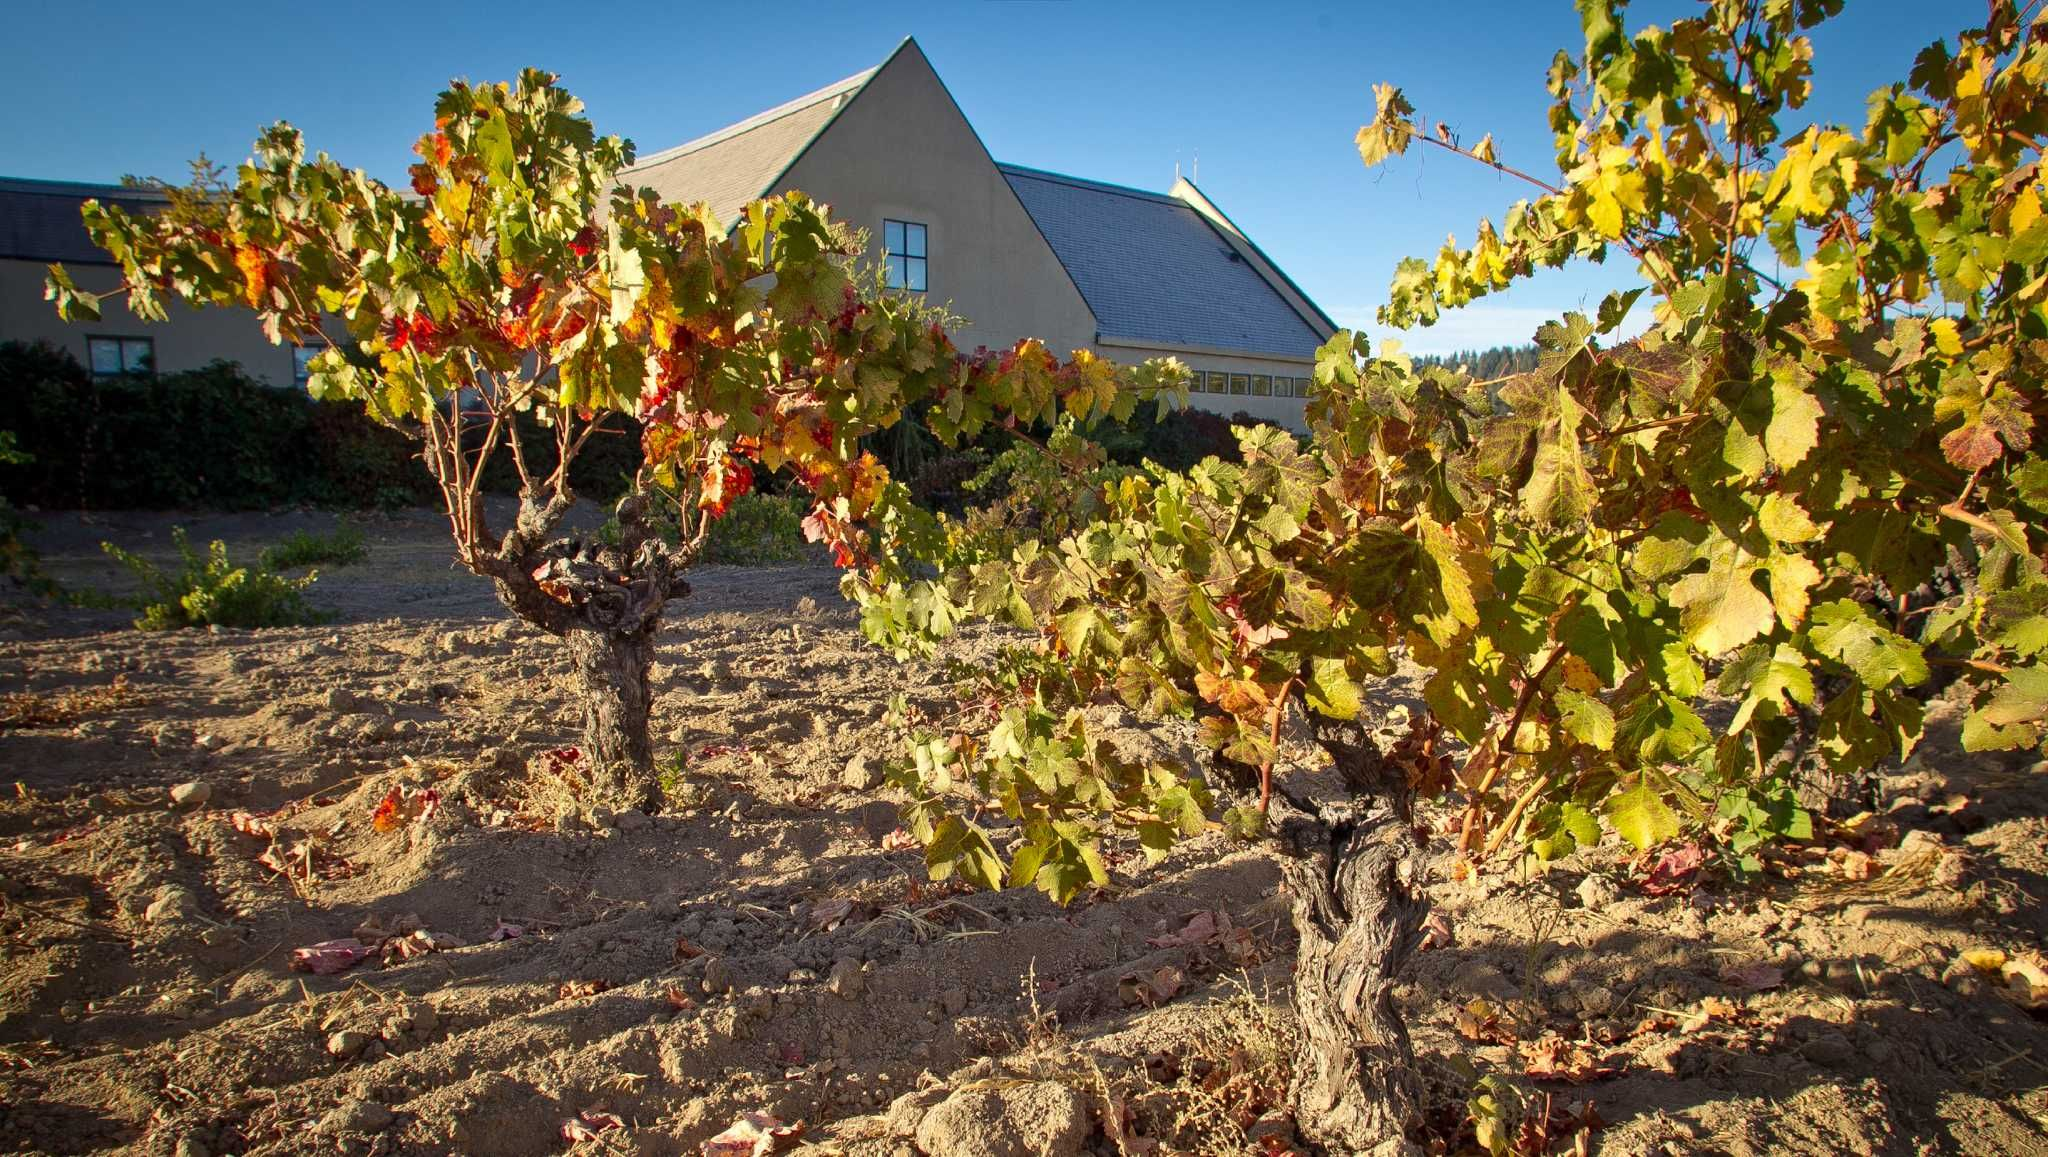 Napa Wine library pairs bookworms history buffs